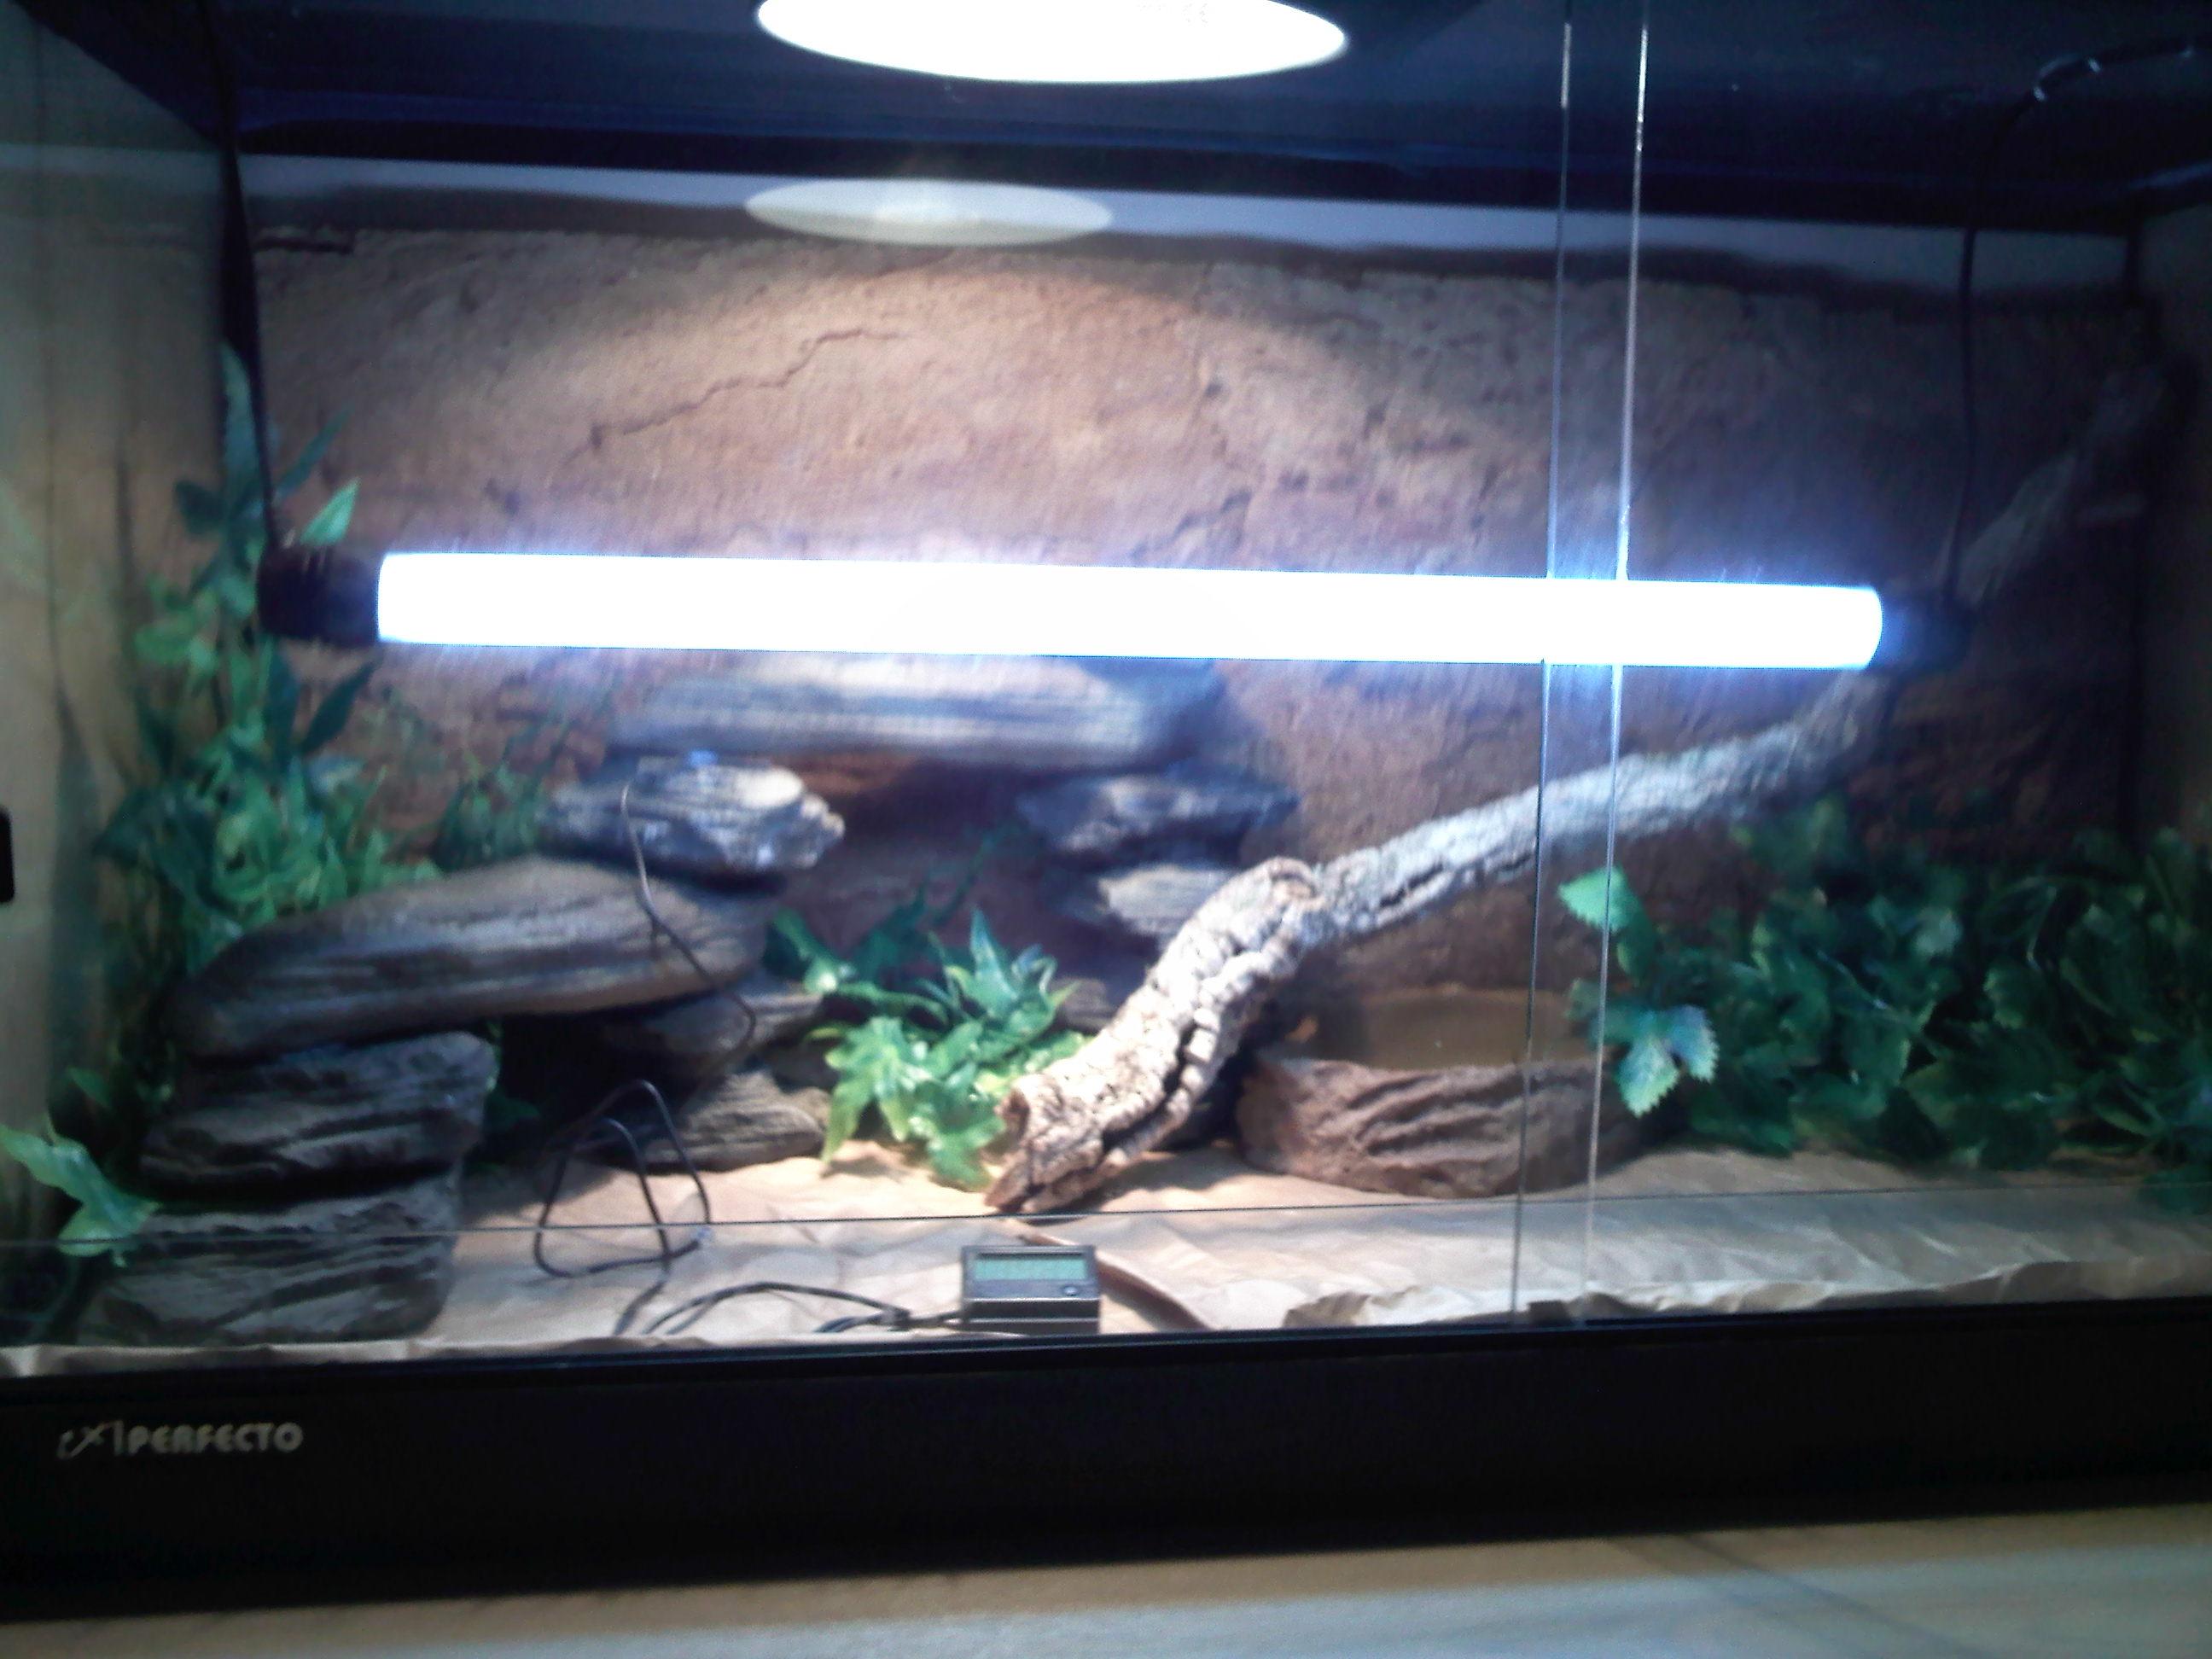 Full bearded dragon gecko or small lizard setup-img020.jpg ... & Eastern Full bearded dragon gecko or small lizard setup - Reptile ... azcodes.com